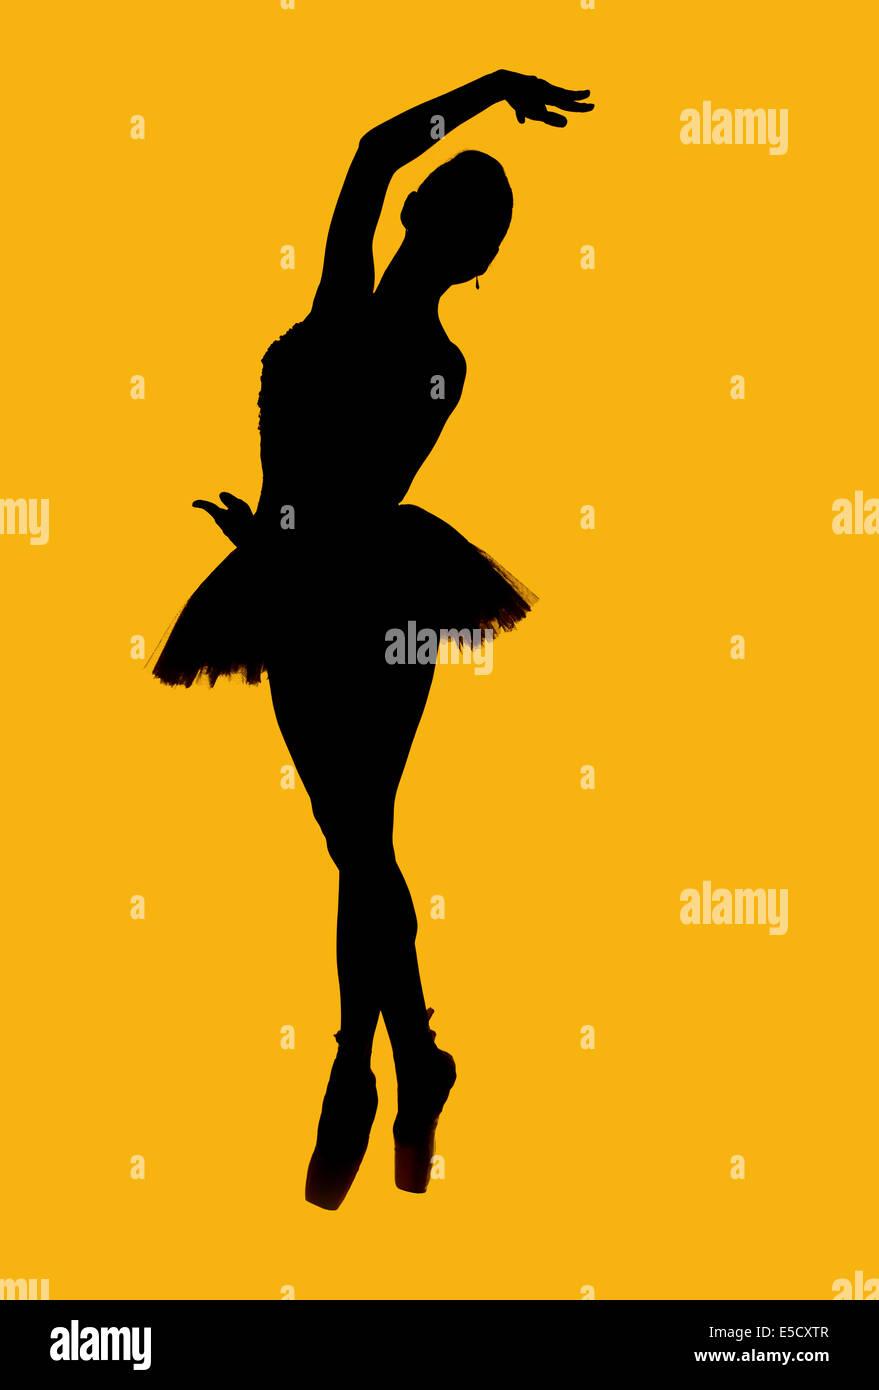 Black silhouette of ballerina - Stock Image